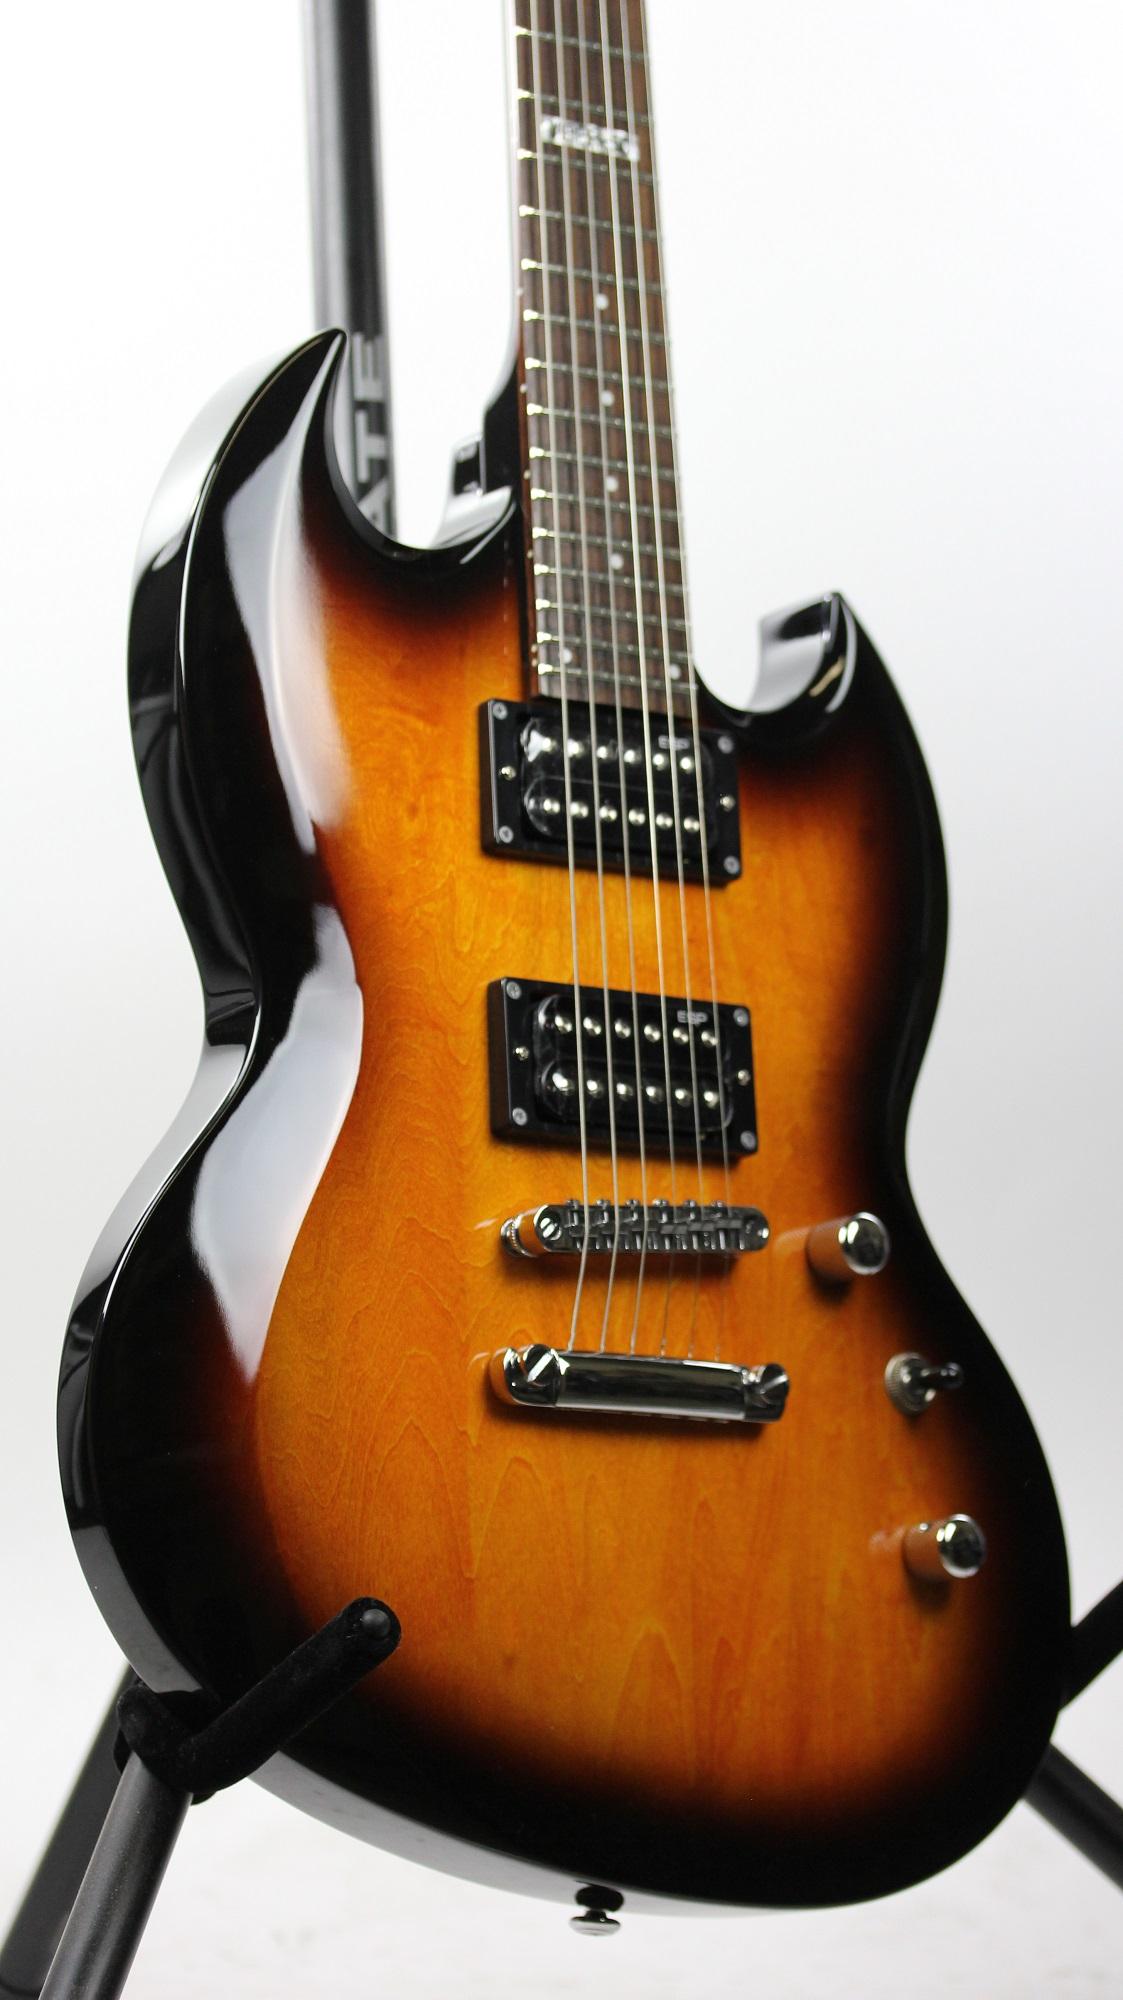 esp ltd viper 50 2 tone burst sample prototype electric guitar 2155 6. Black Bedroom Furniture Sets. Home Design Ideas